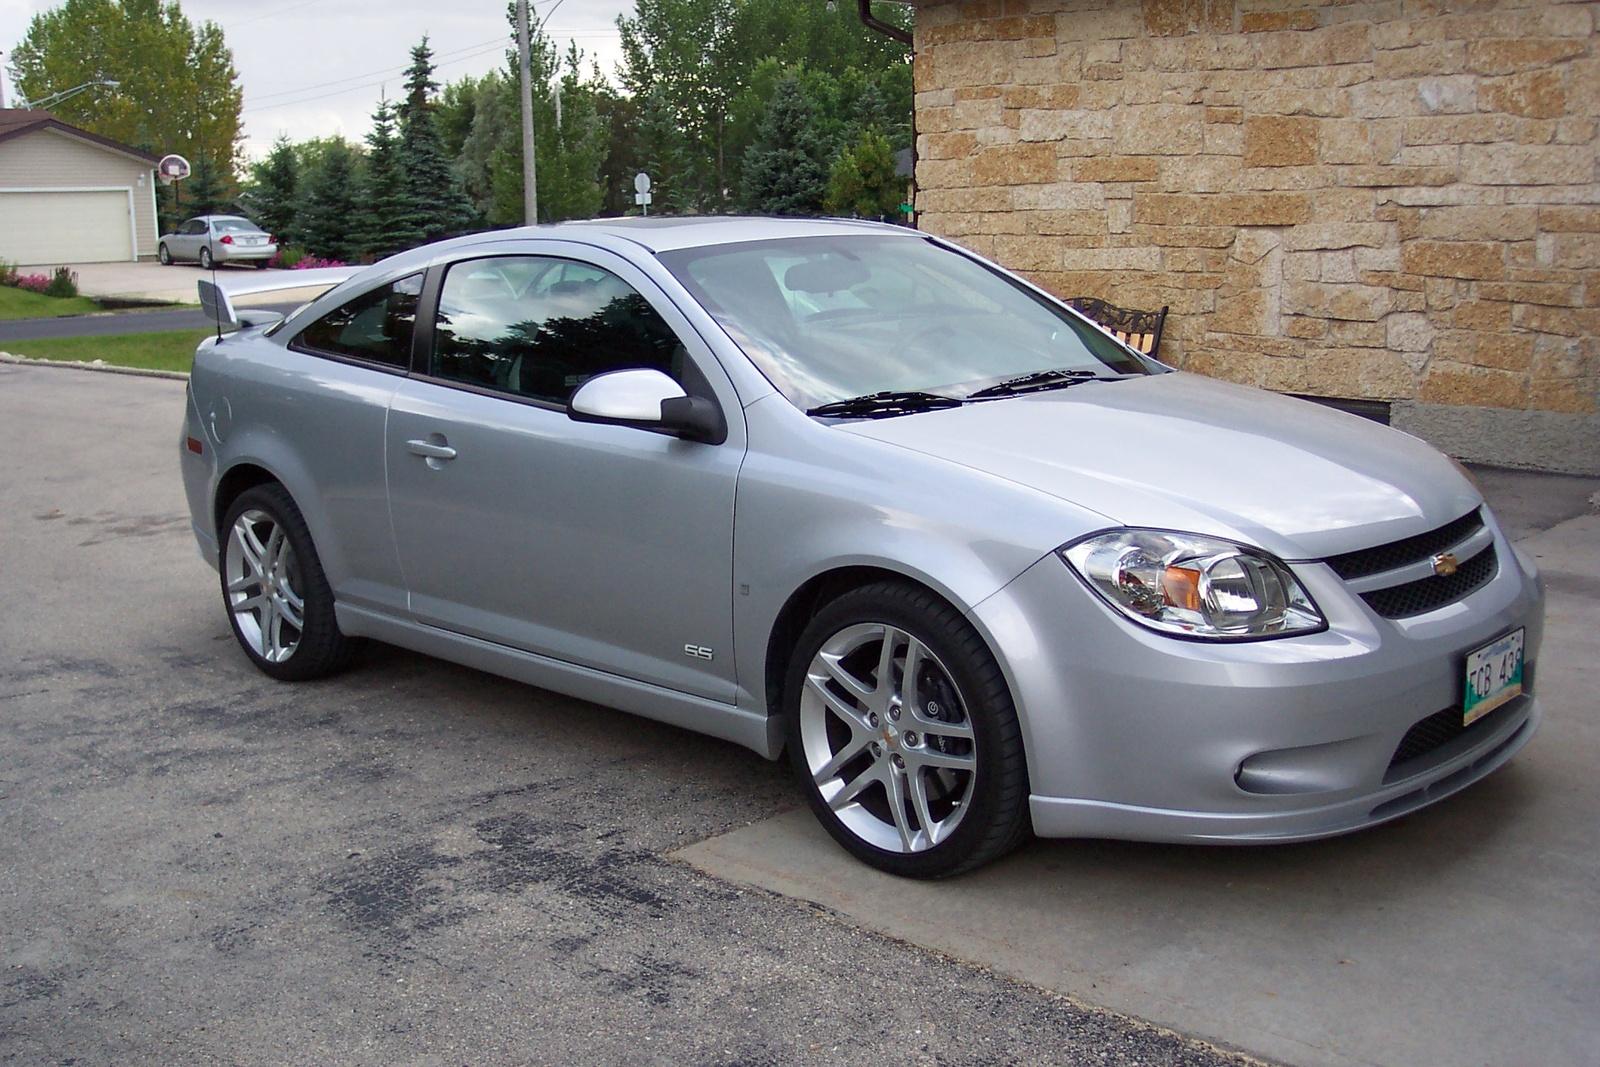 2008 Chevrolet Cobalt Sport Coupe - Pictures - 2008 Chevrolet Cobalt ...